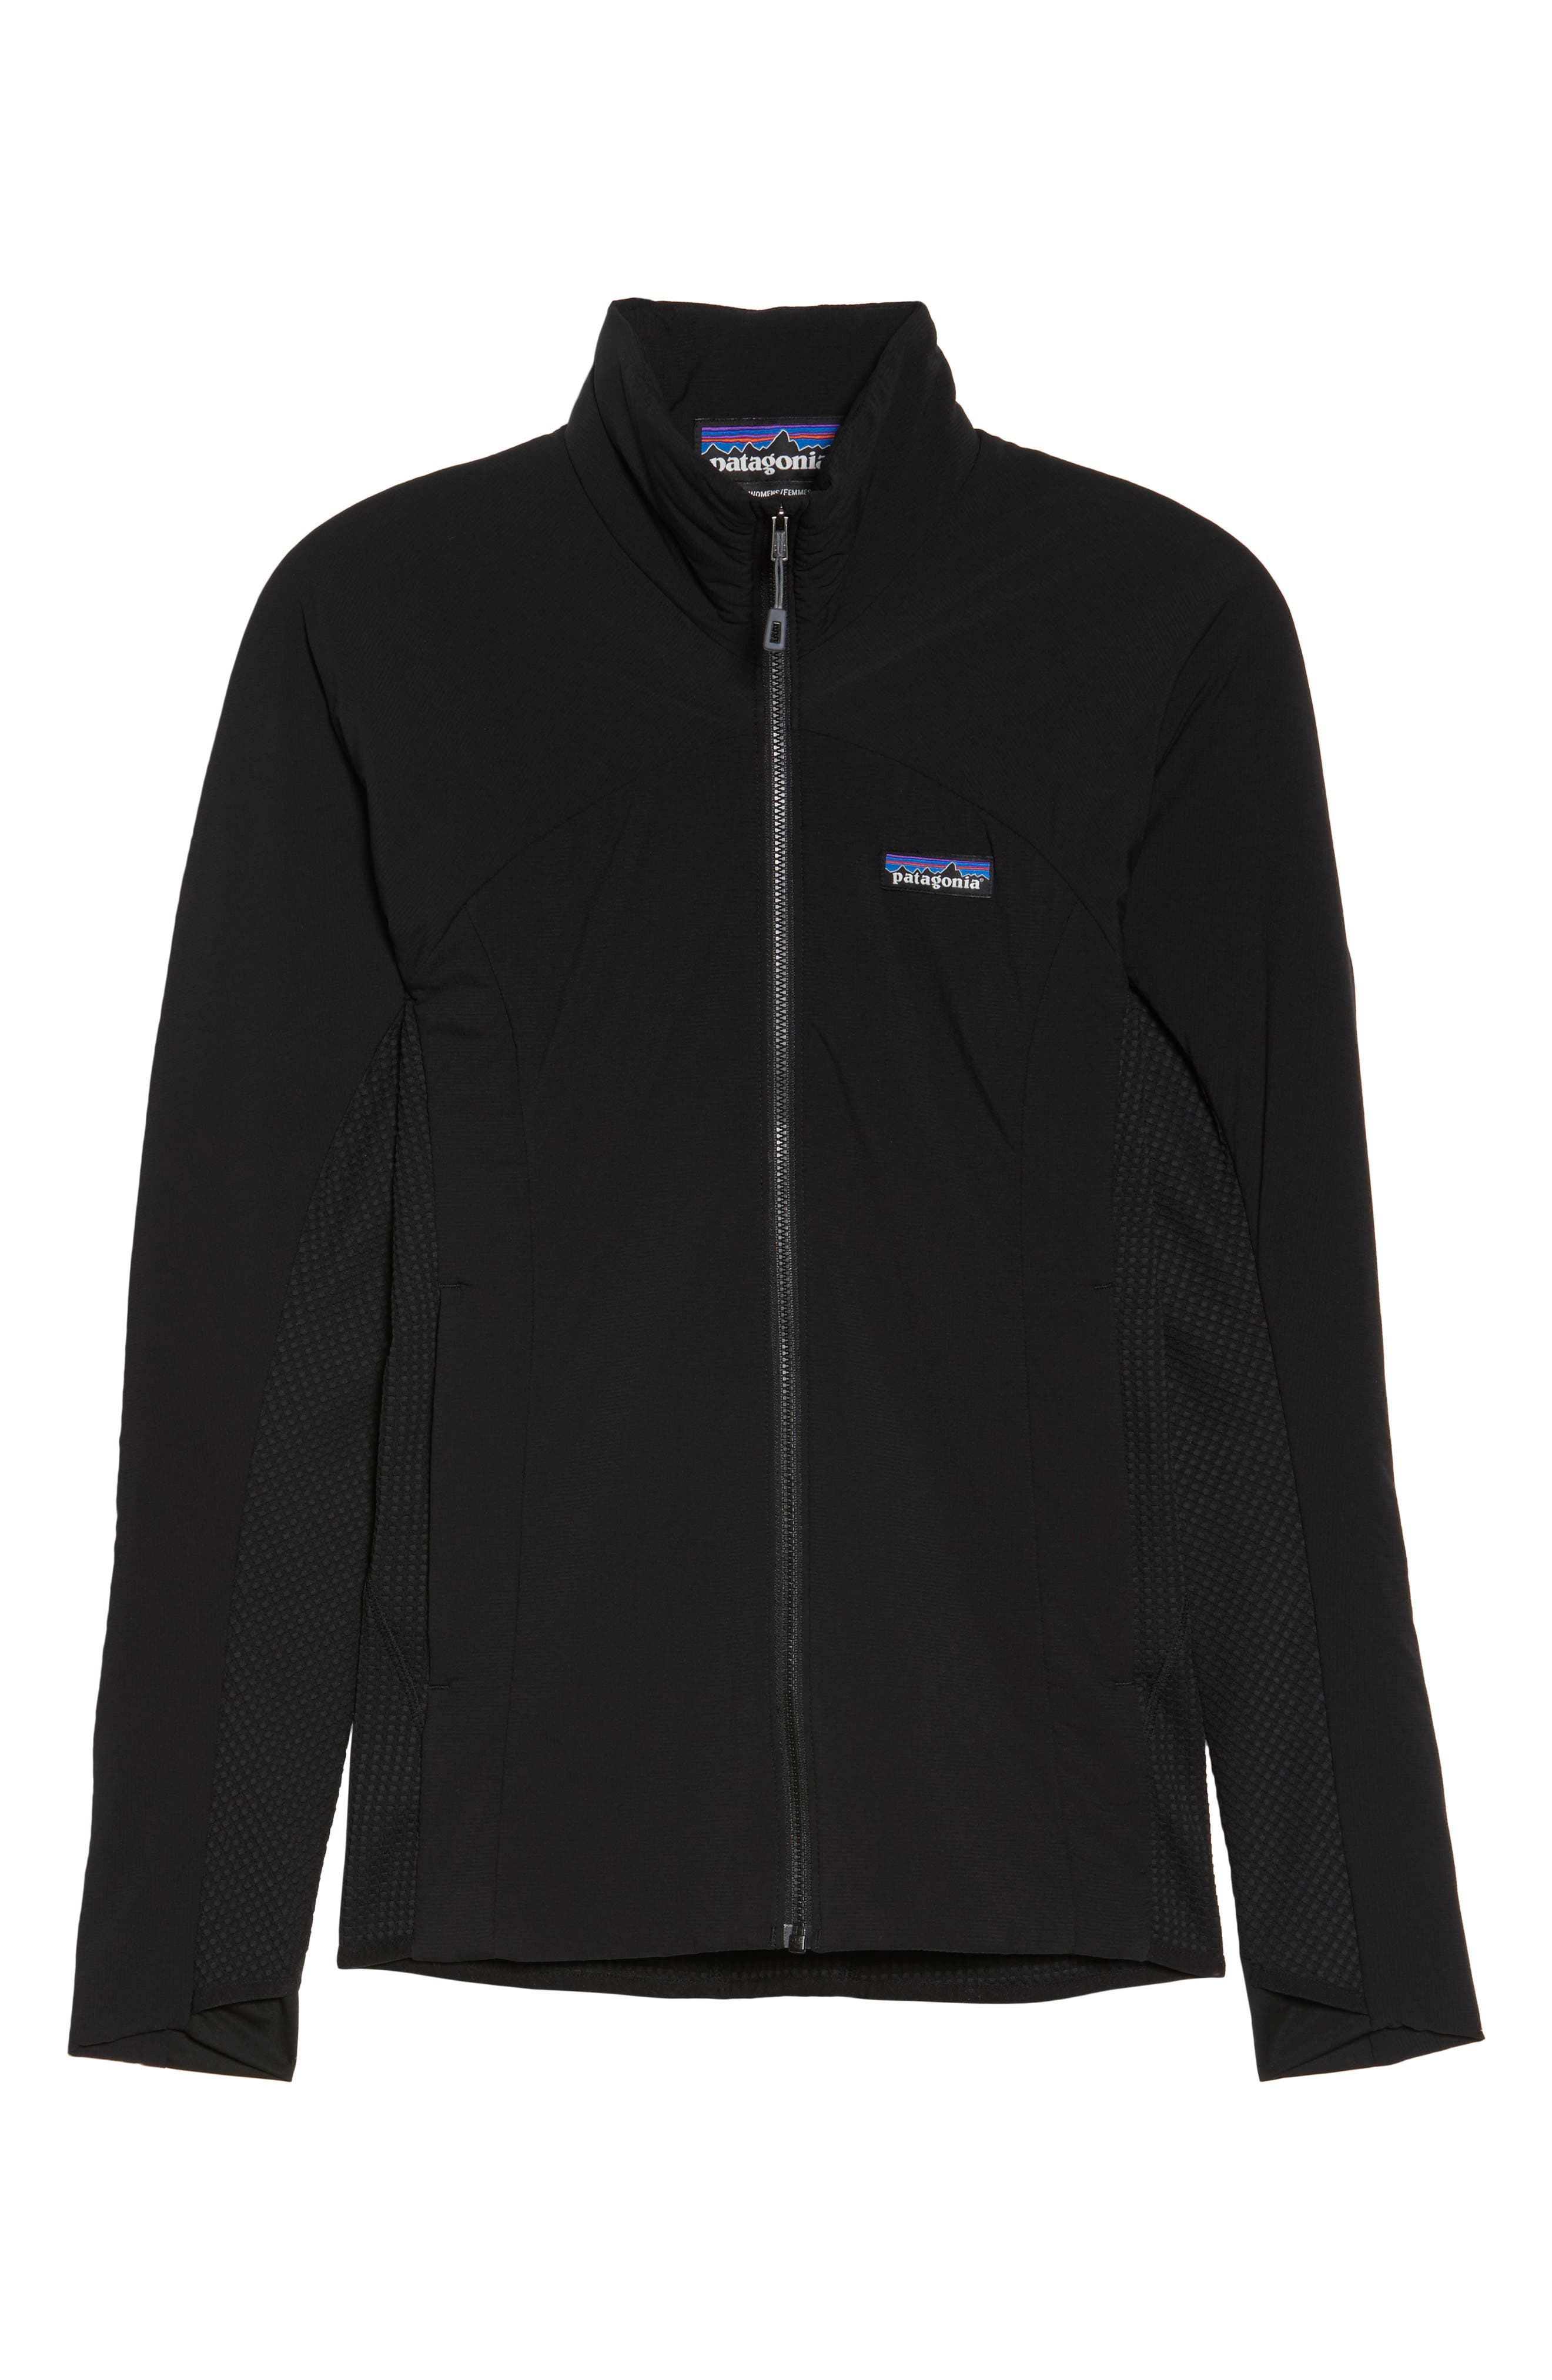 PATAGONIA, Nano-Air<sup>®</sup> Light Hybrid Jacket, Alternate thumbnail 5, color, BLACK